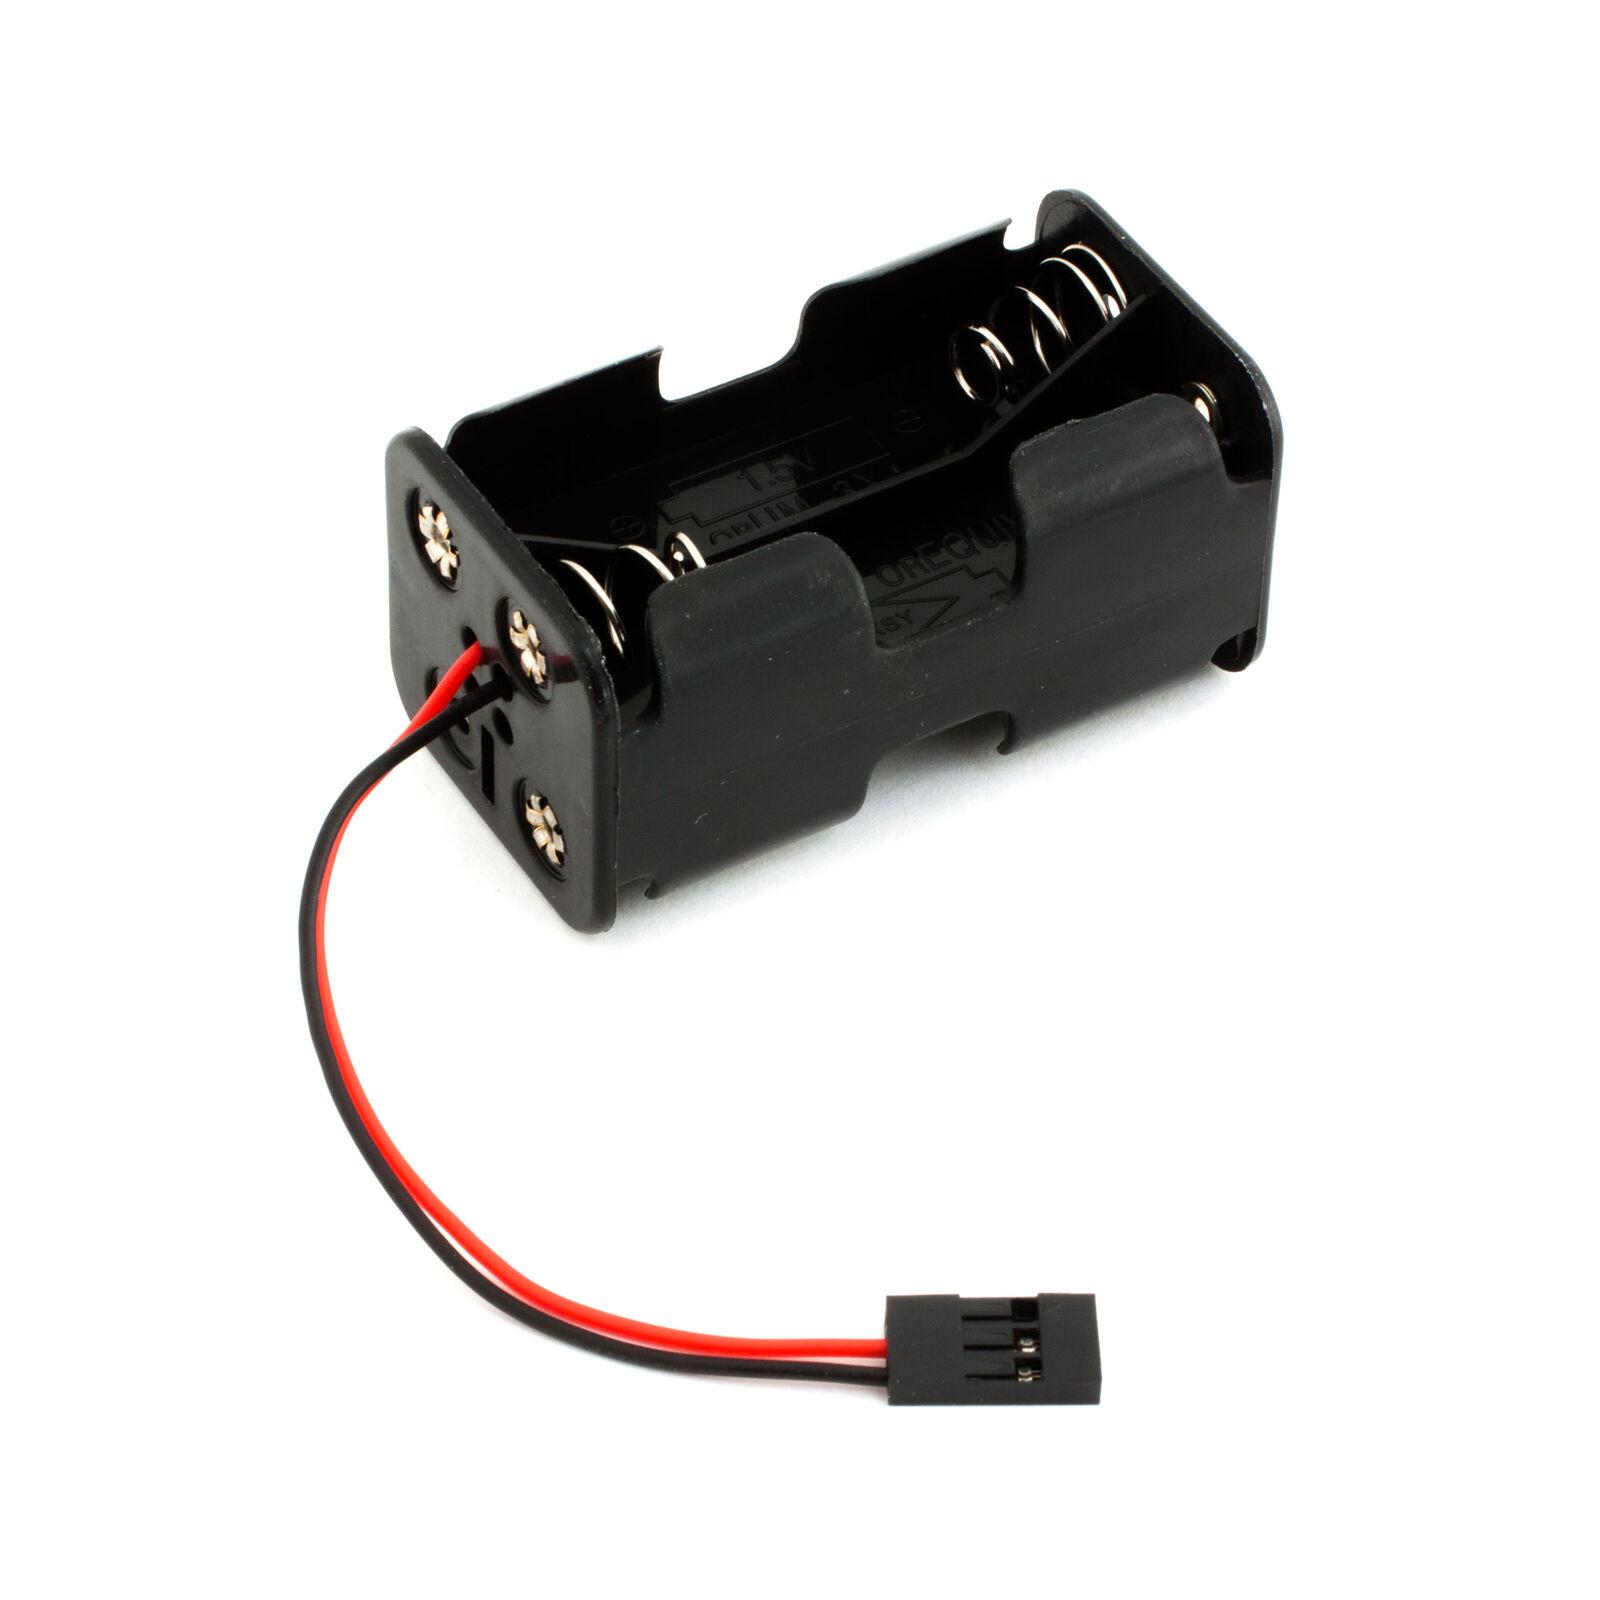 Westward 18 -Support de batterie